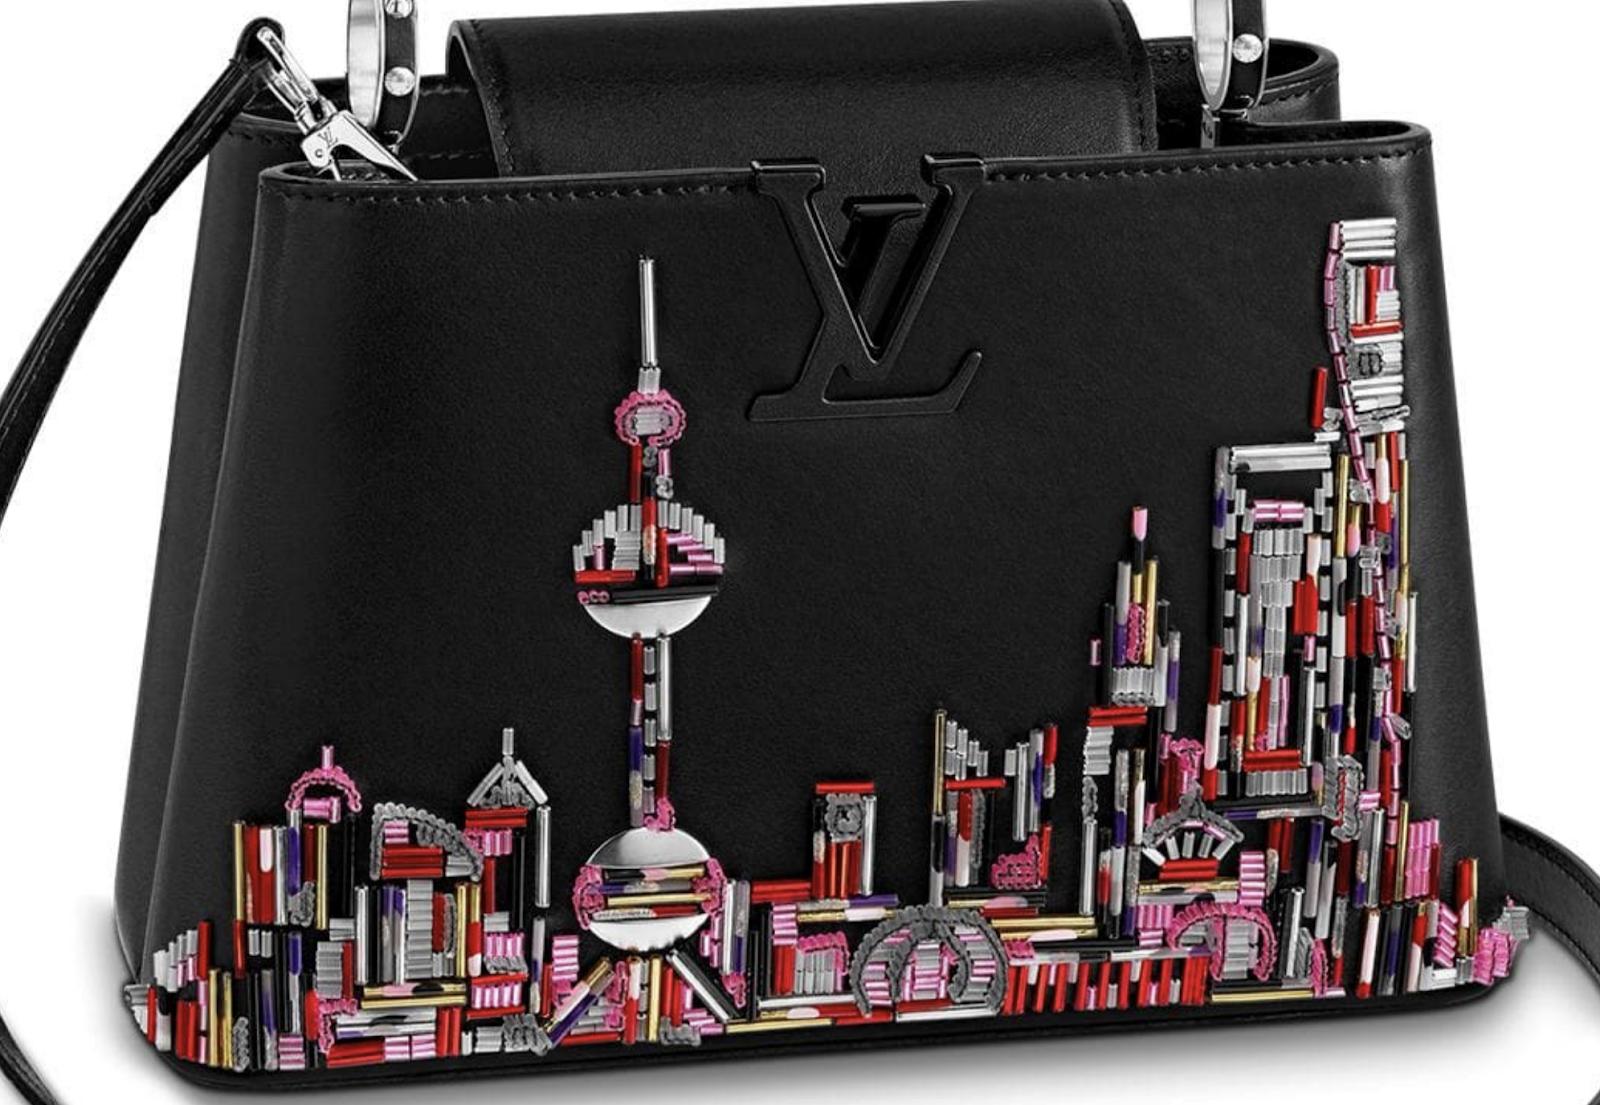 Princess Charlene Wears a Louis Vuitton Capucines bag o Open Princess Grace Exhibition in Macau